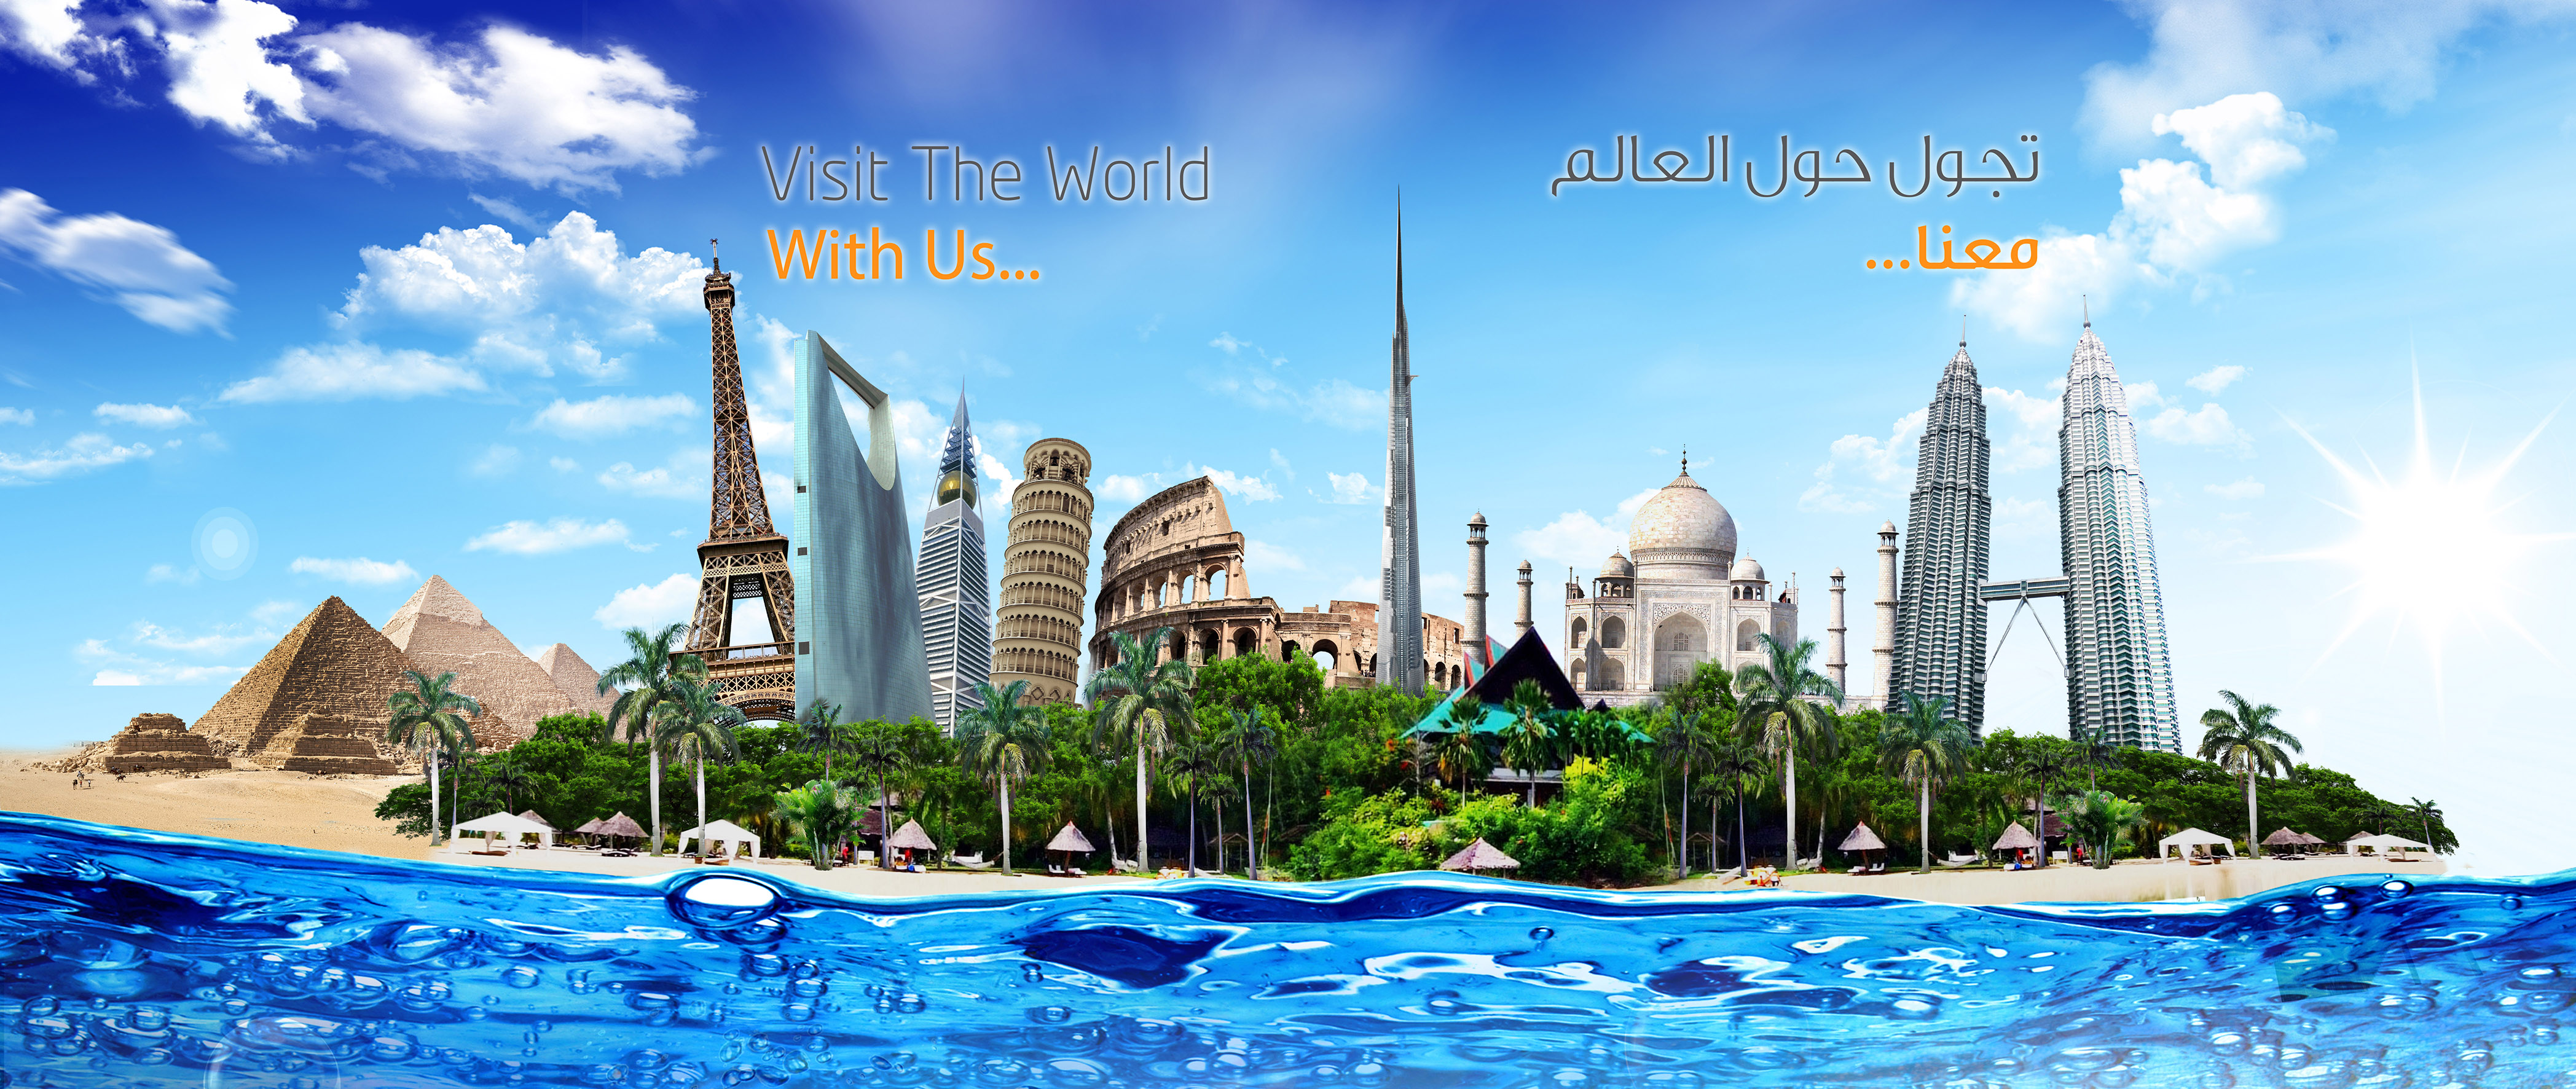 Travel Sticker_Jeddah 3m x 7.10m